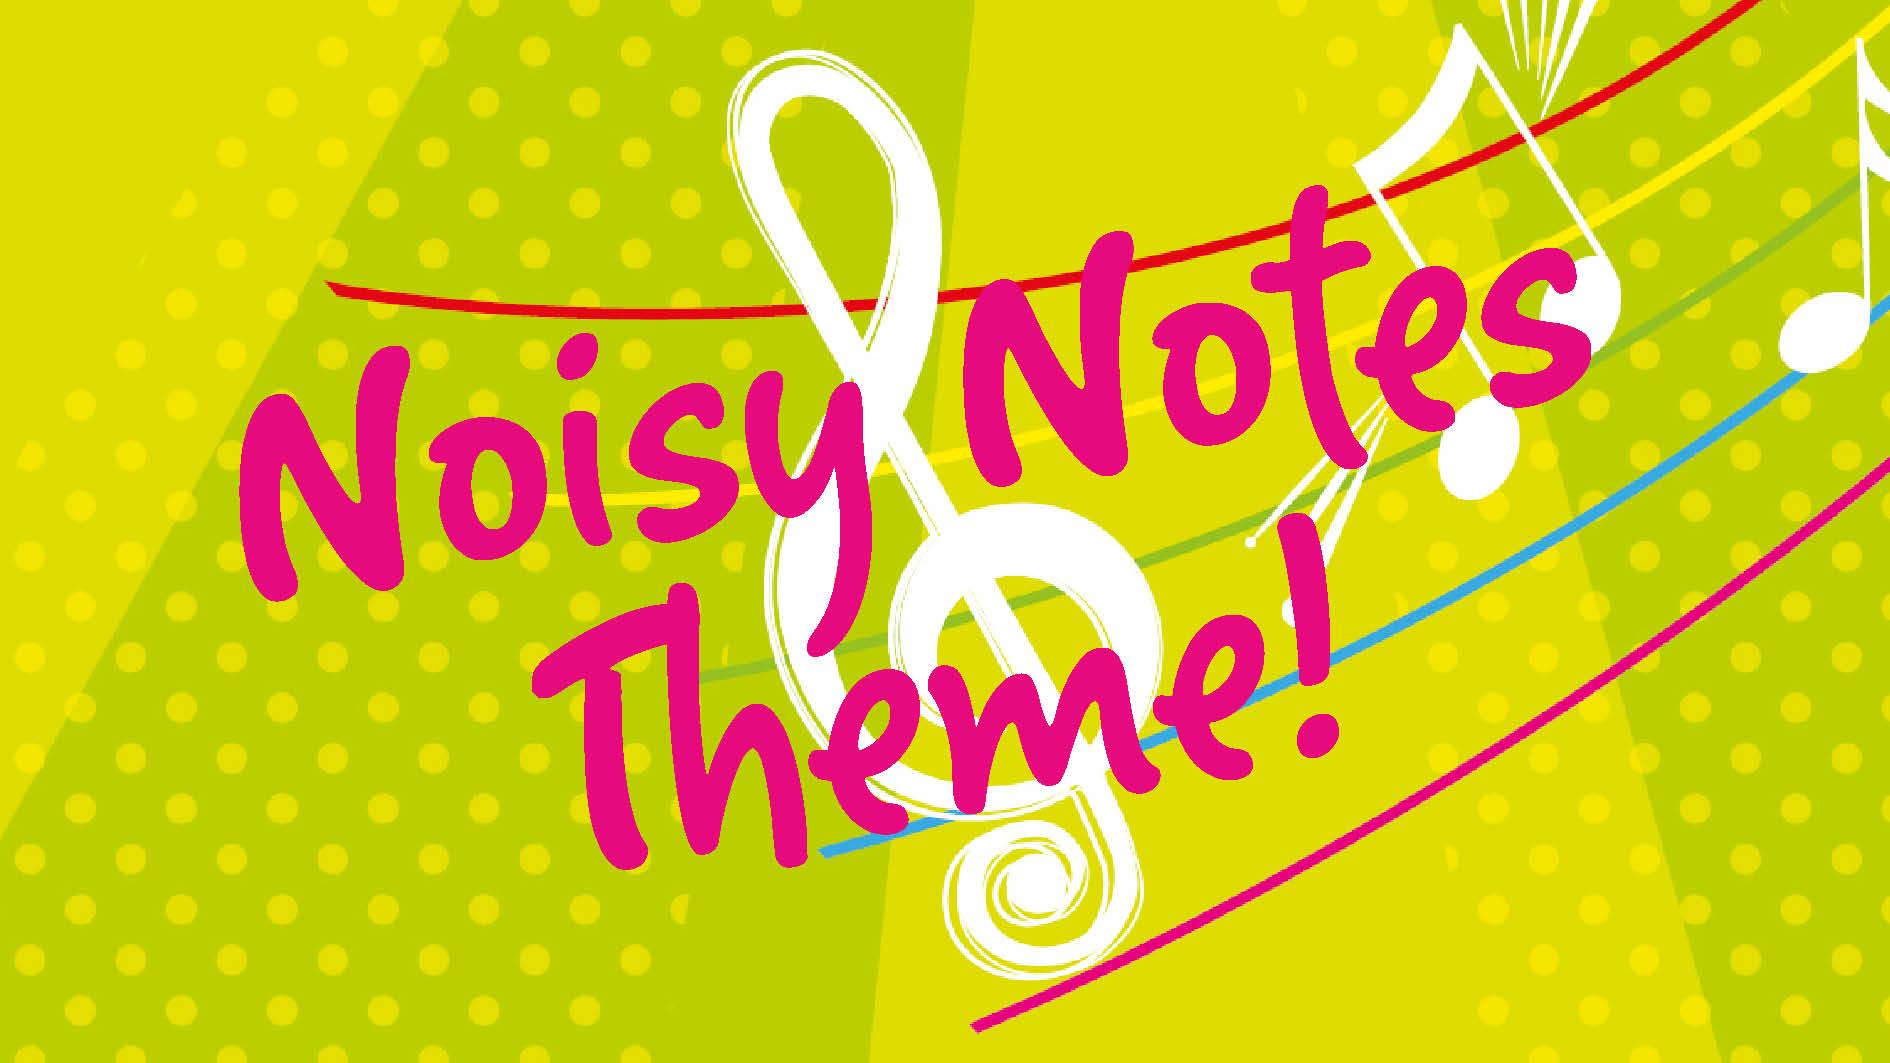 Noisy Notes Theme.jpg